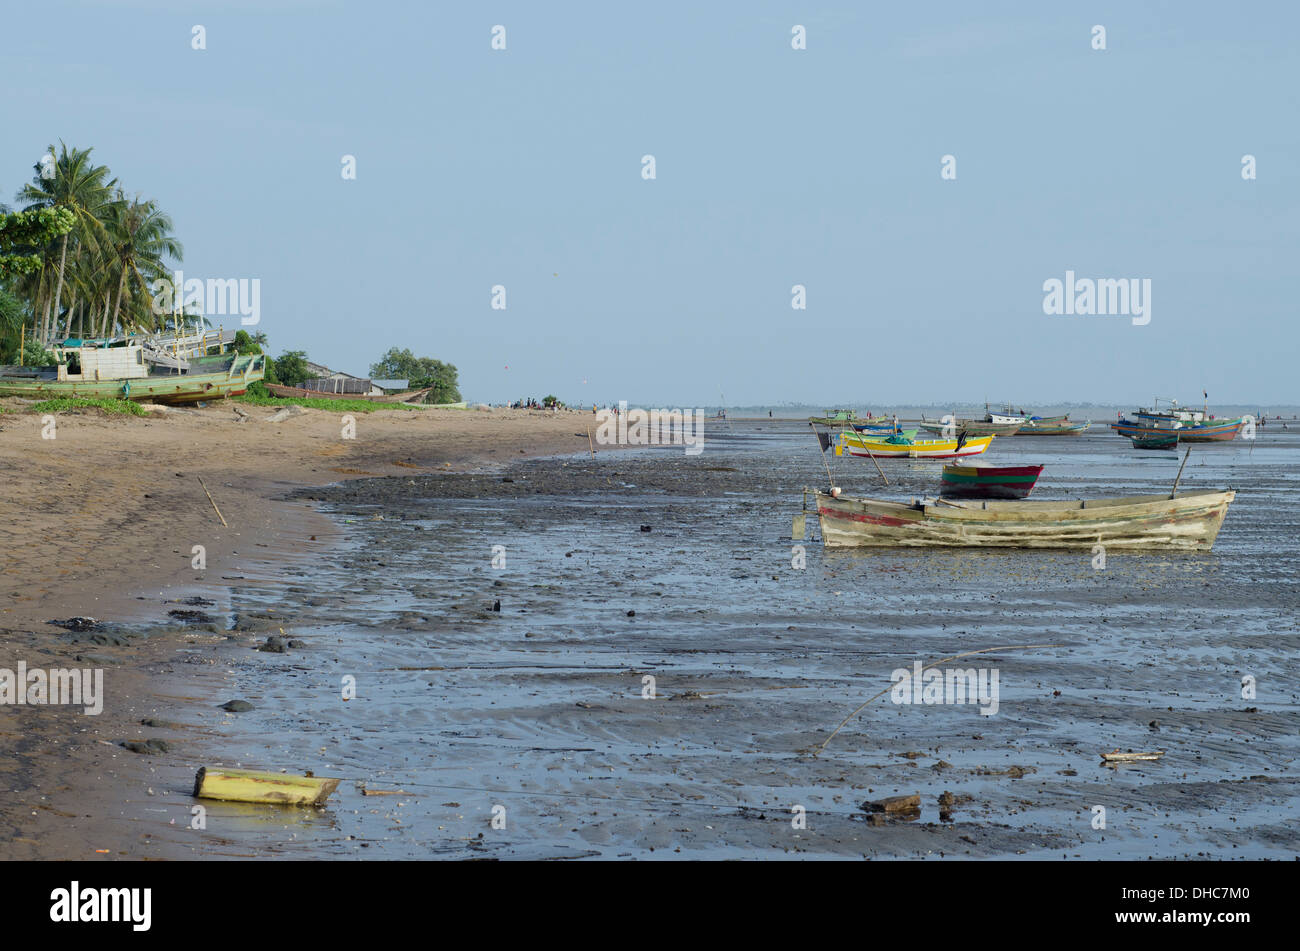 Fishing boats in Ketapang, West Kalimantan (Indonesian Borneo) - Stock Image